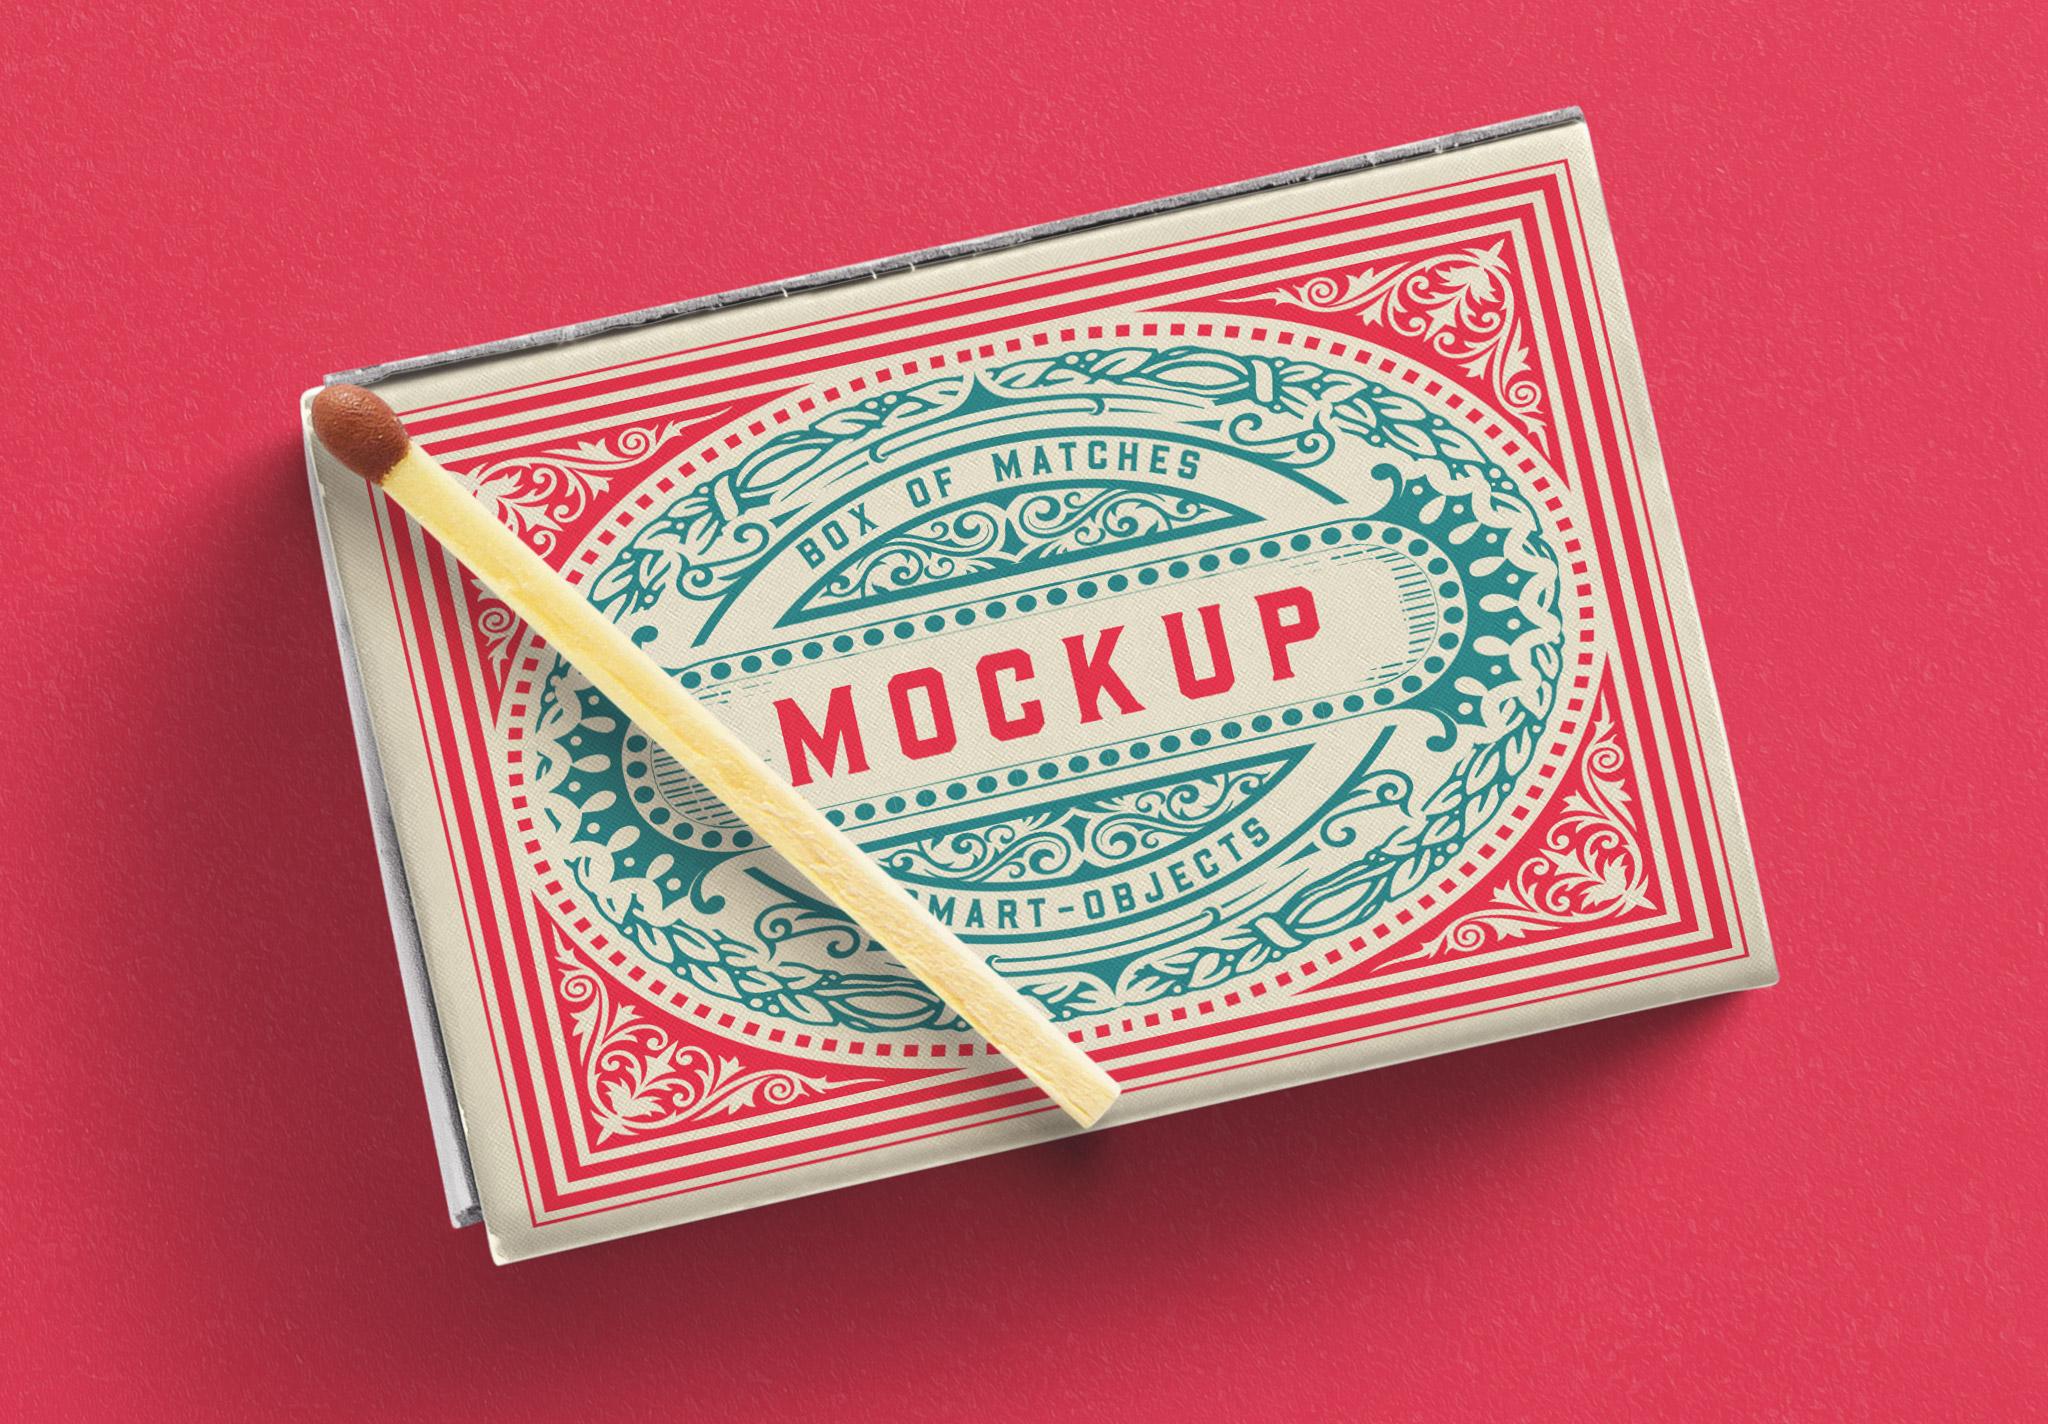 Box Matches Mockup image04